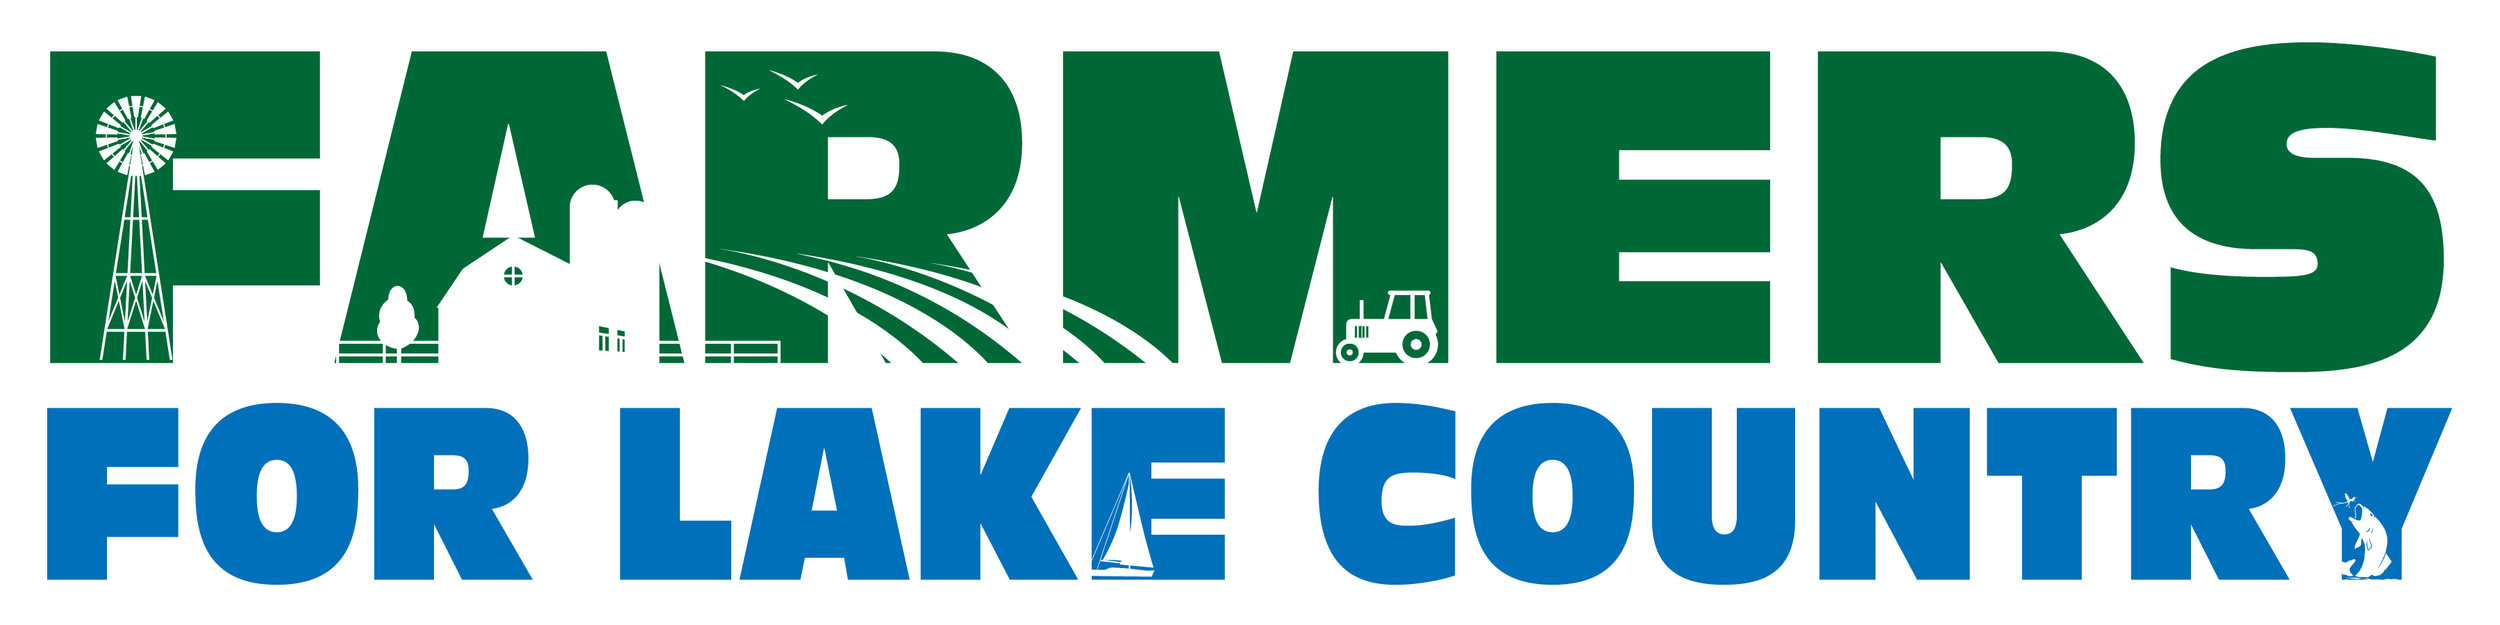 Farmers for Lake Country_logo.jpg